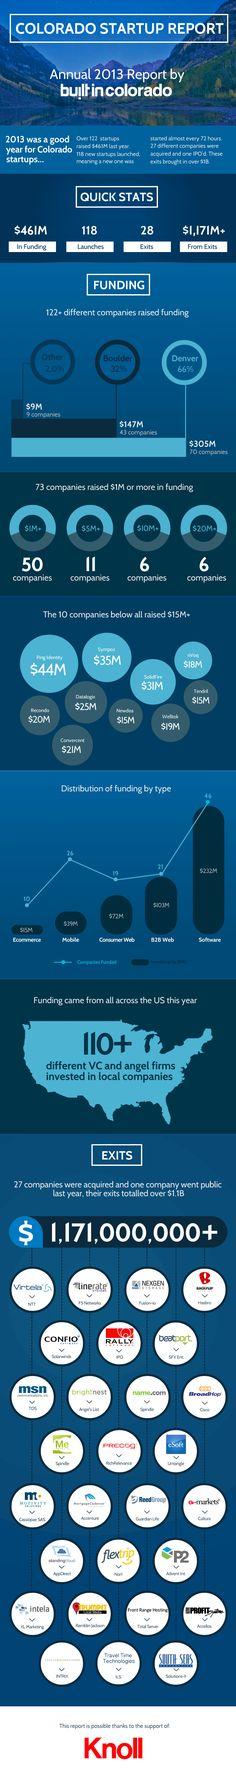 Colorado Startup Report 2013